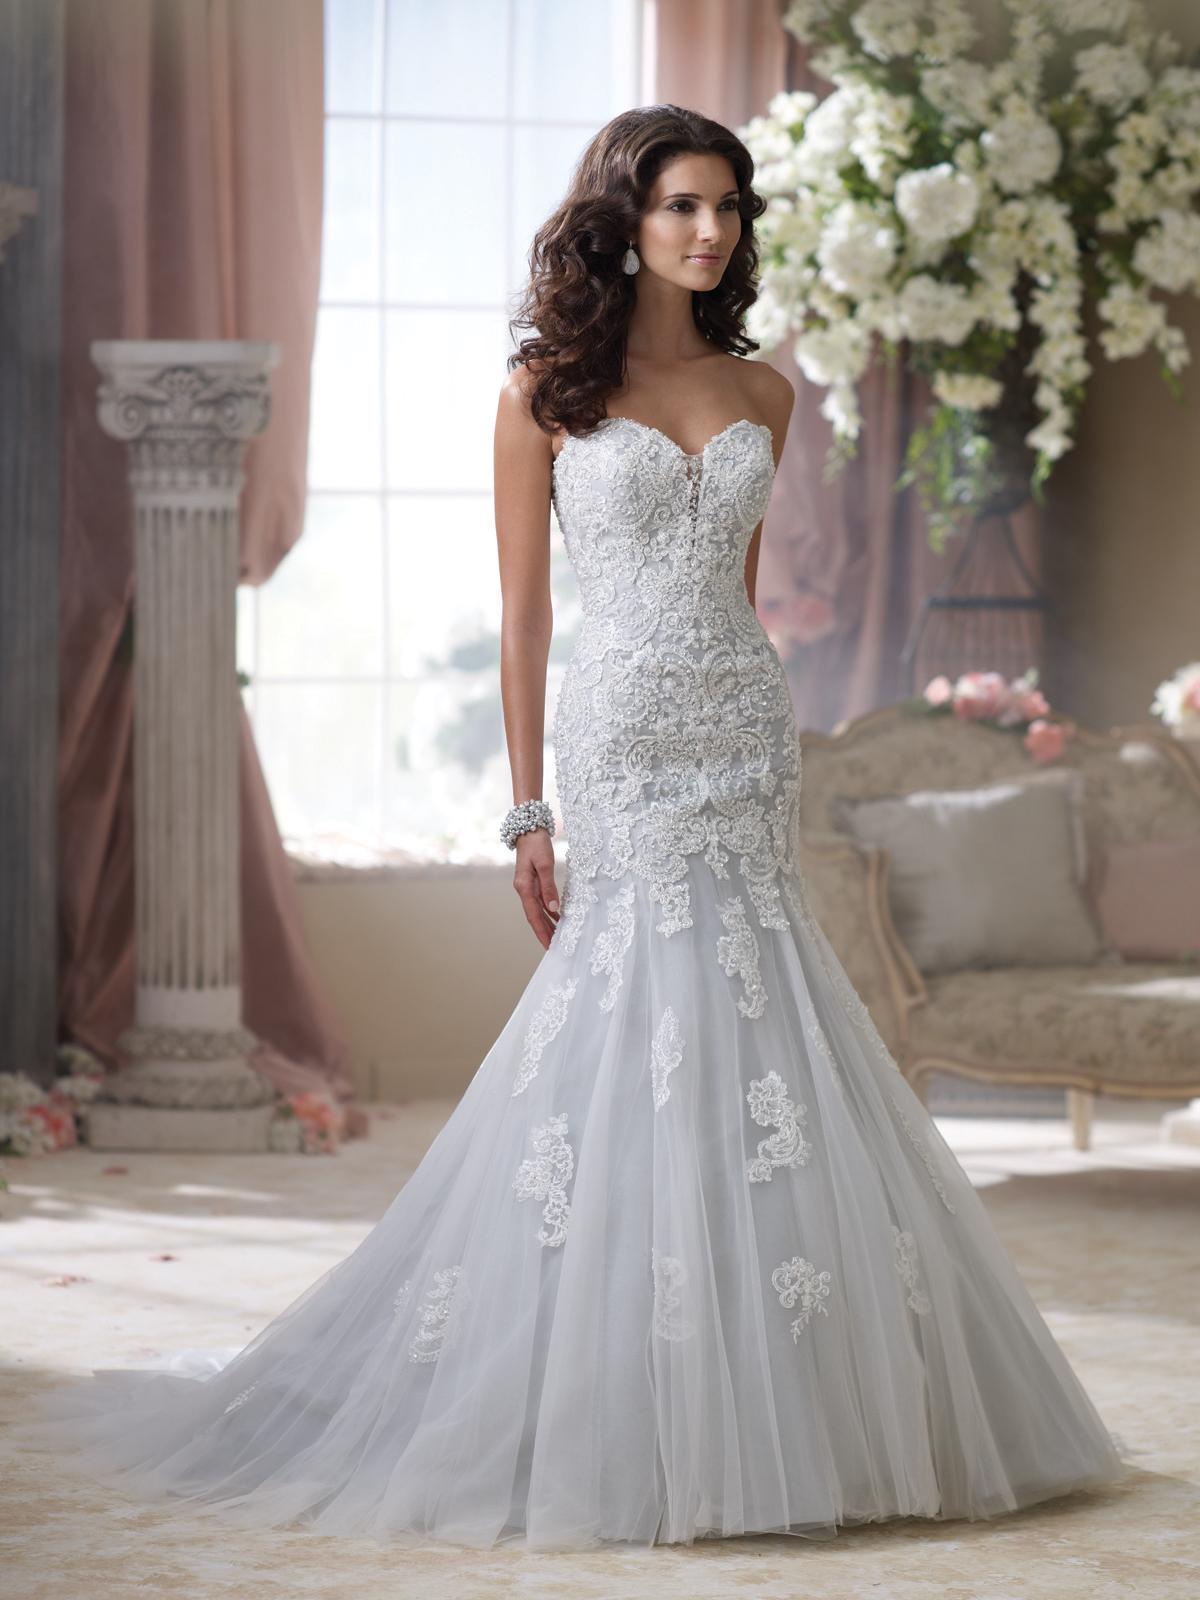 David Tutera Mon Cheri Bridal Gowns Beryl · The Wedding Loft ...